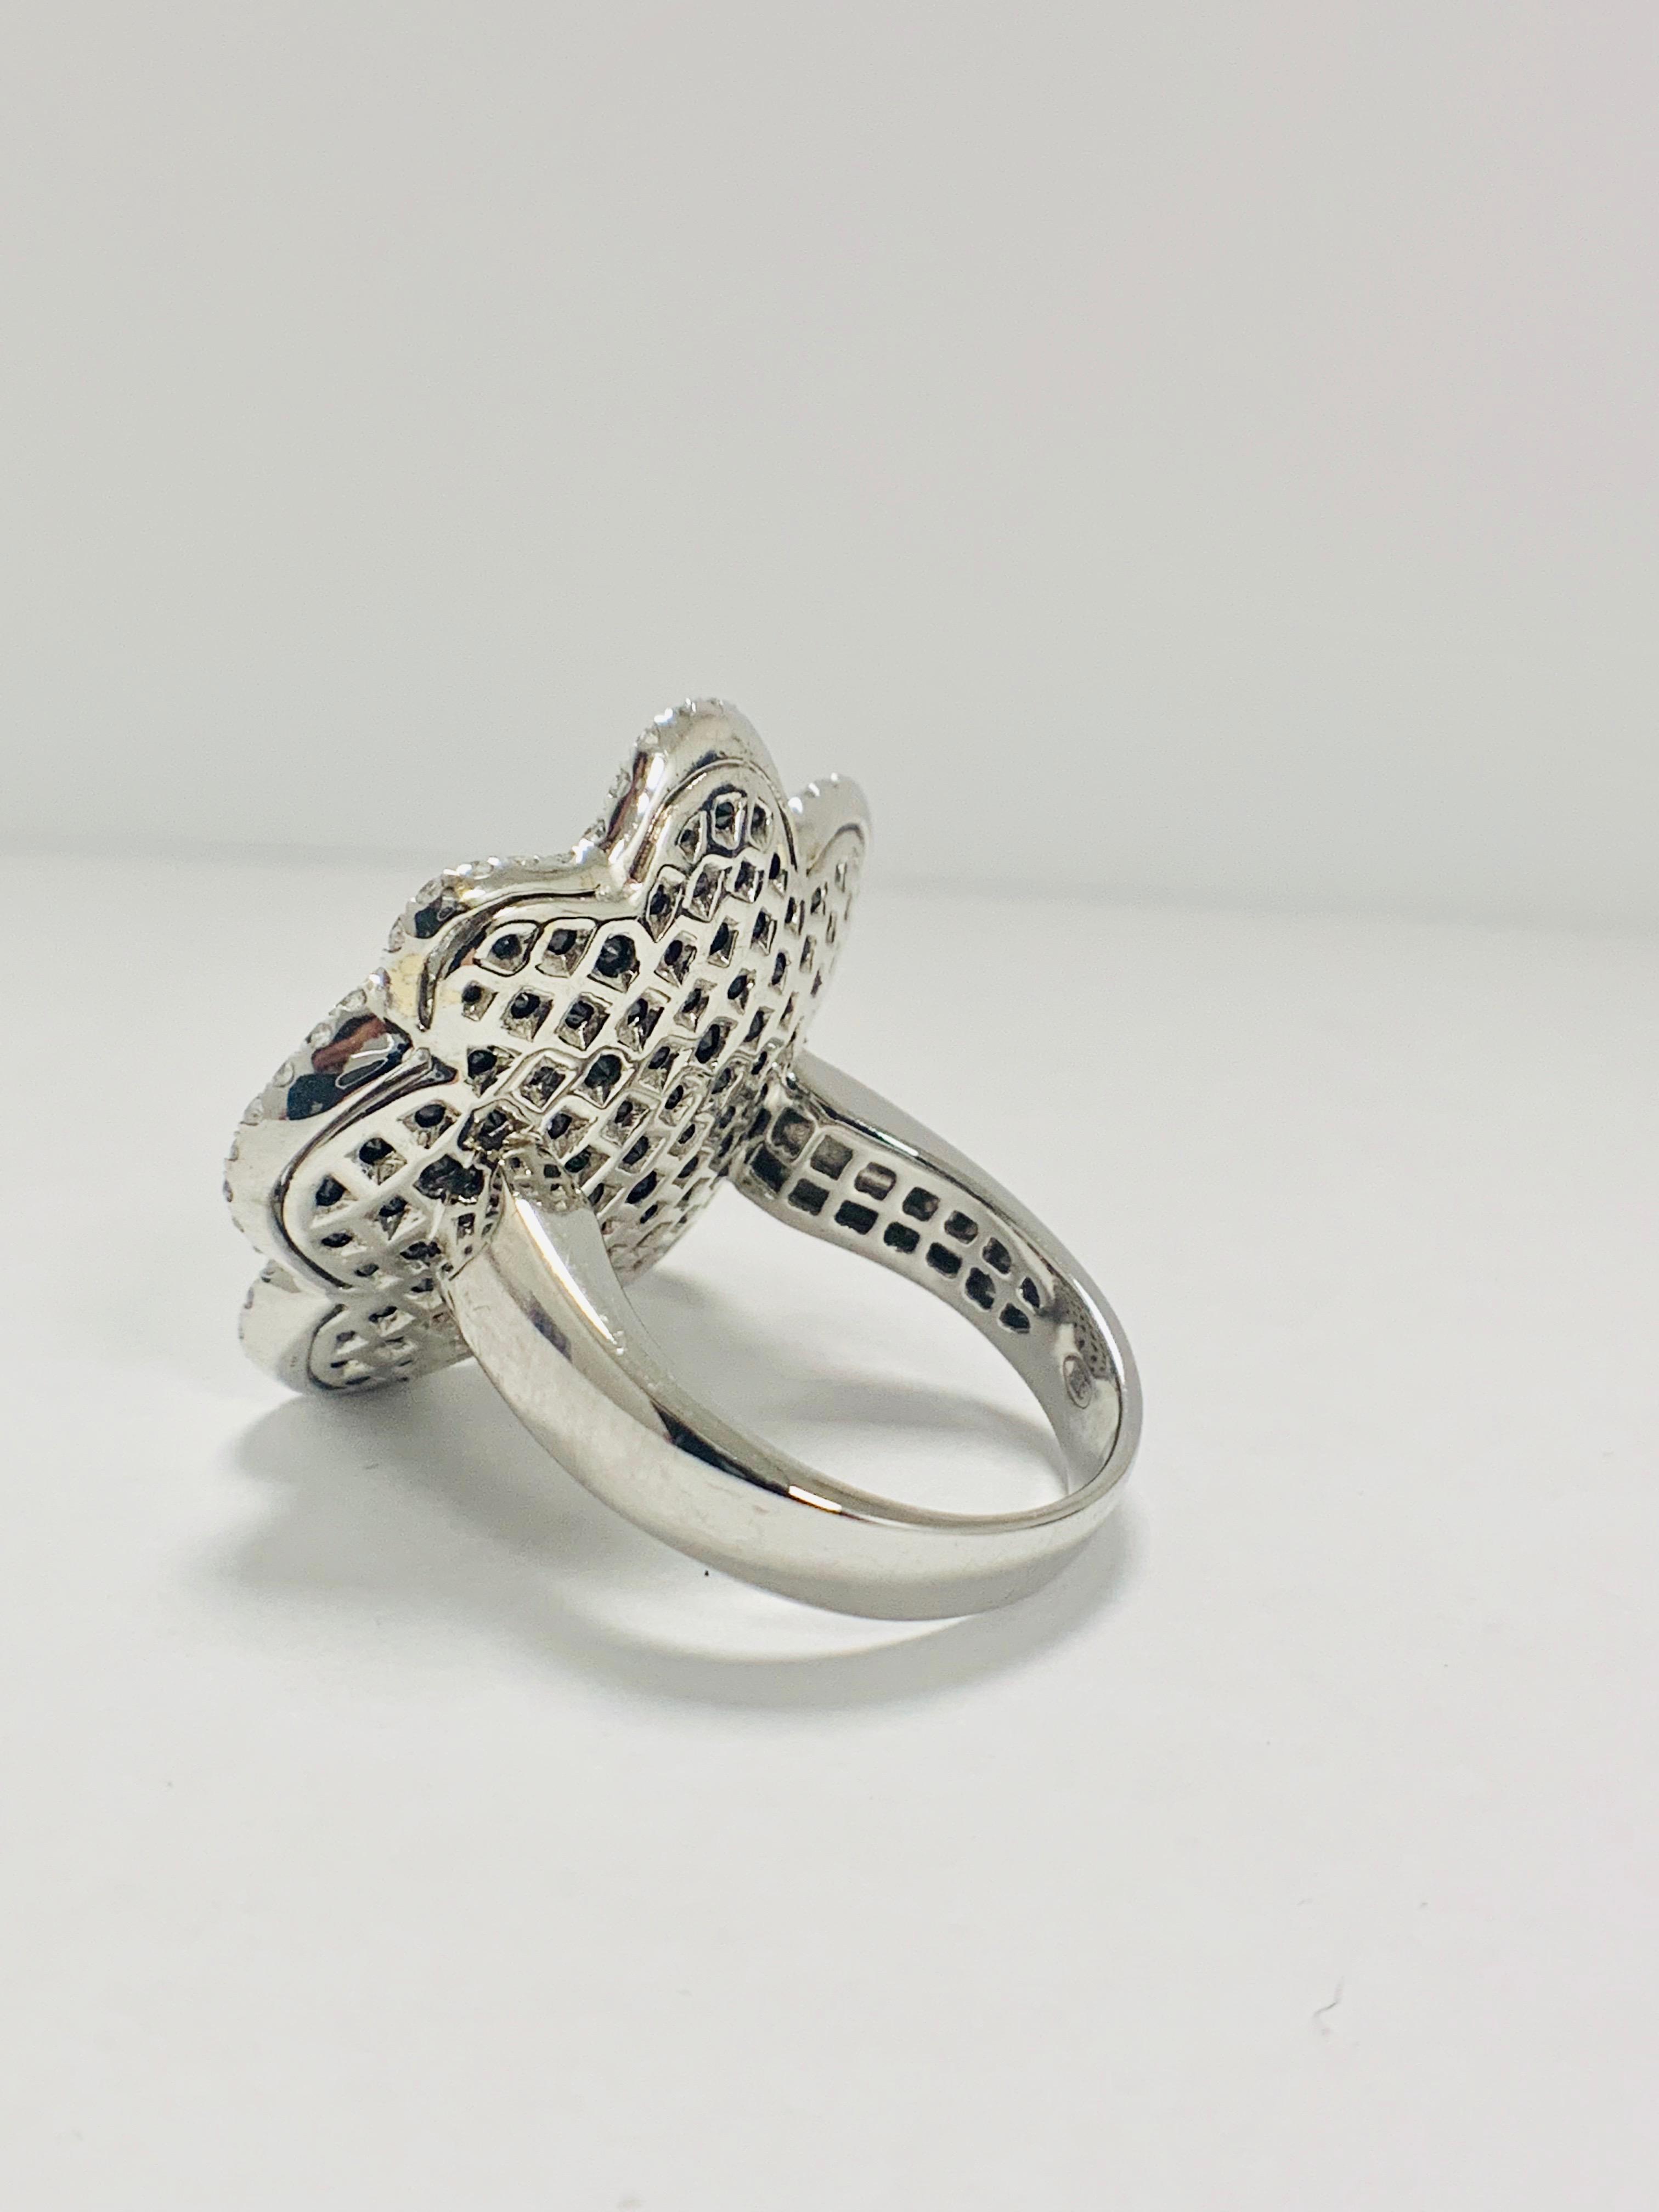 18ct White Gold Diamond flower design ring featuring 123 round cut, black Diamonds (2.25ct TBDW) - Image 3 of 13